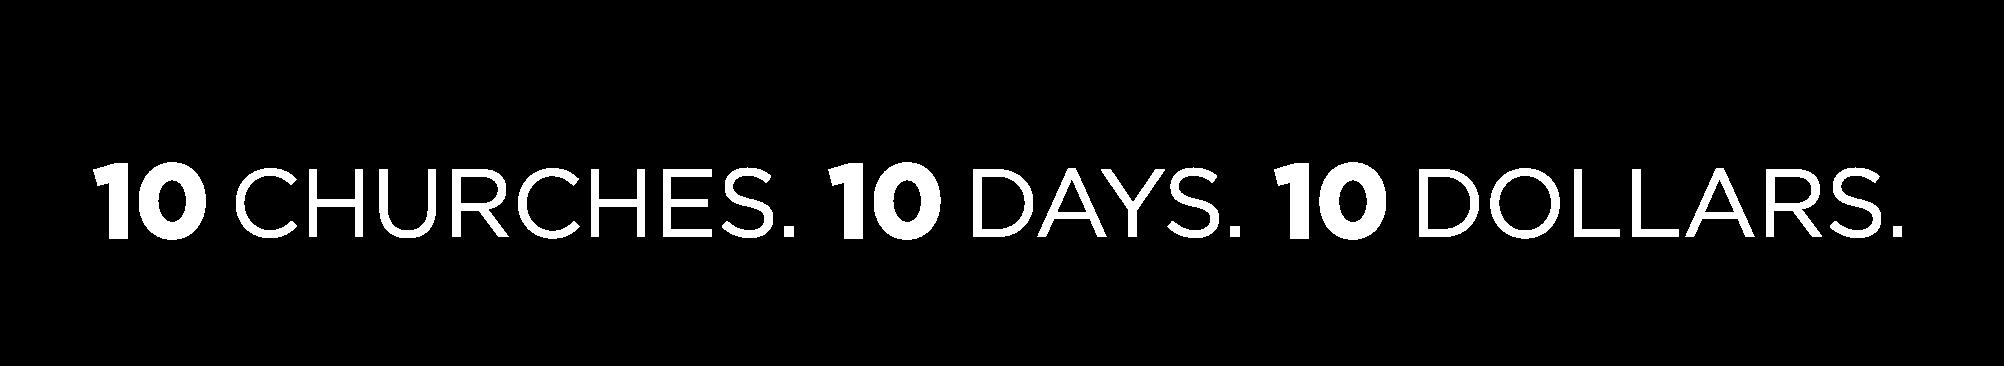 10, 10, 10